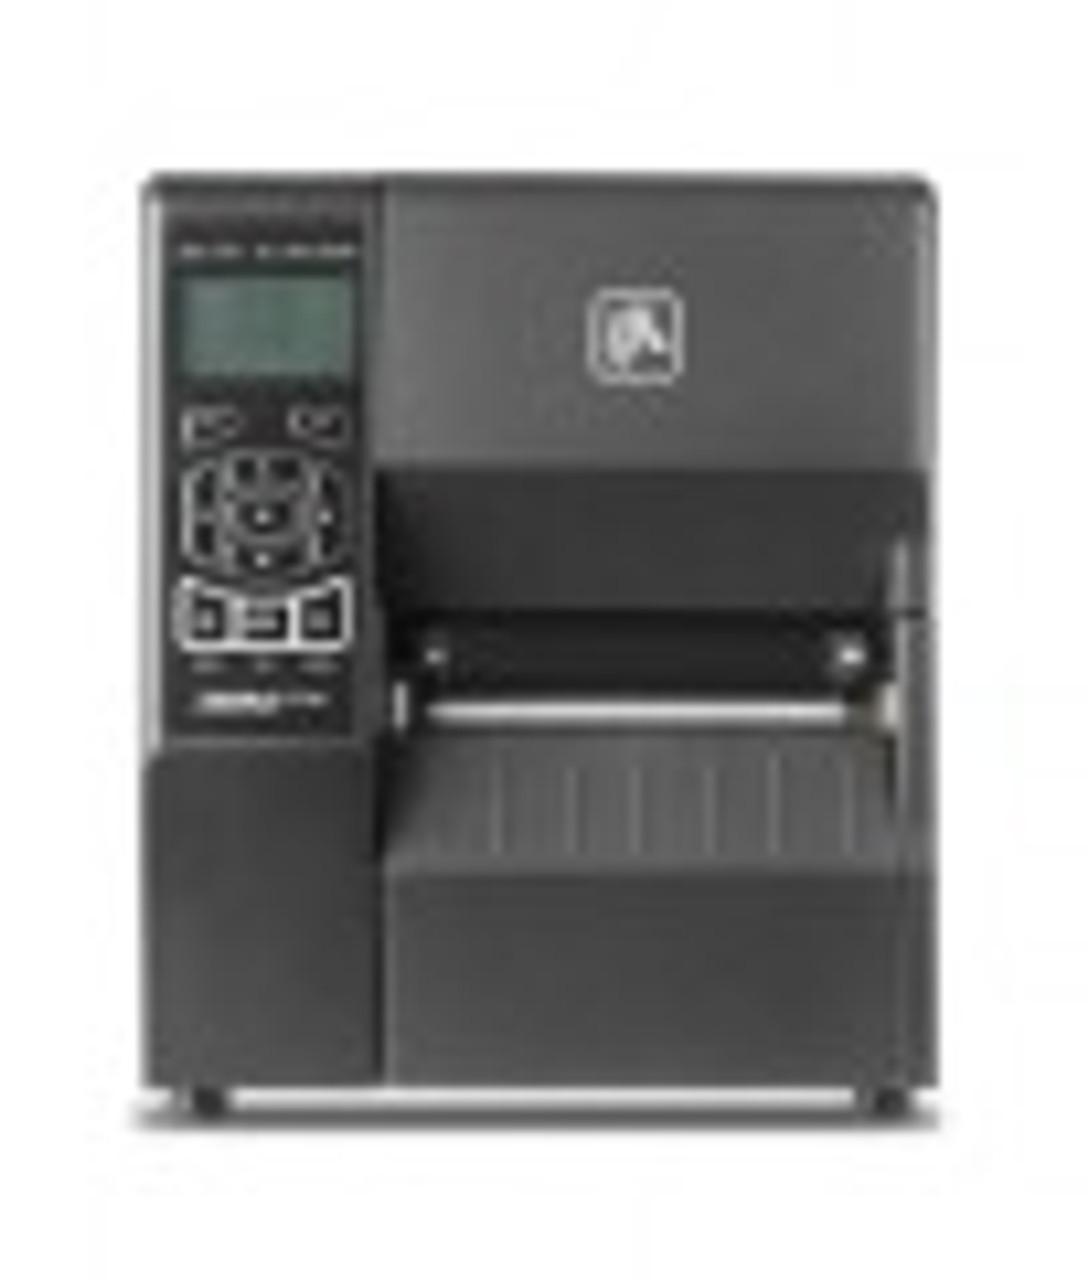 ZT230 Printers